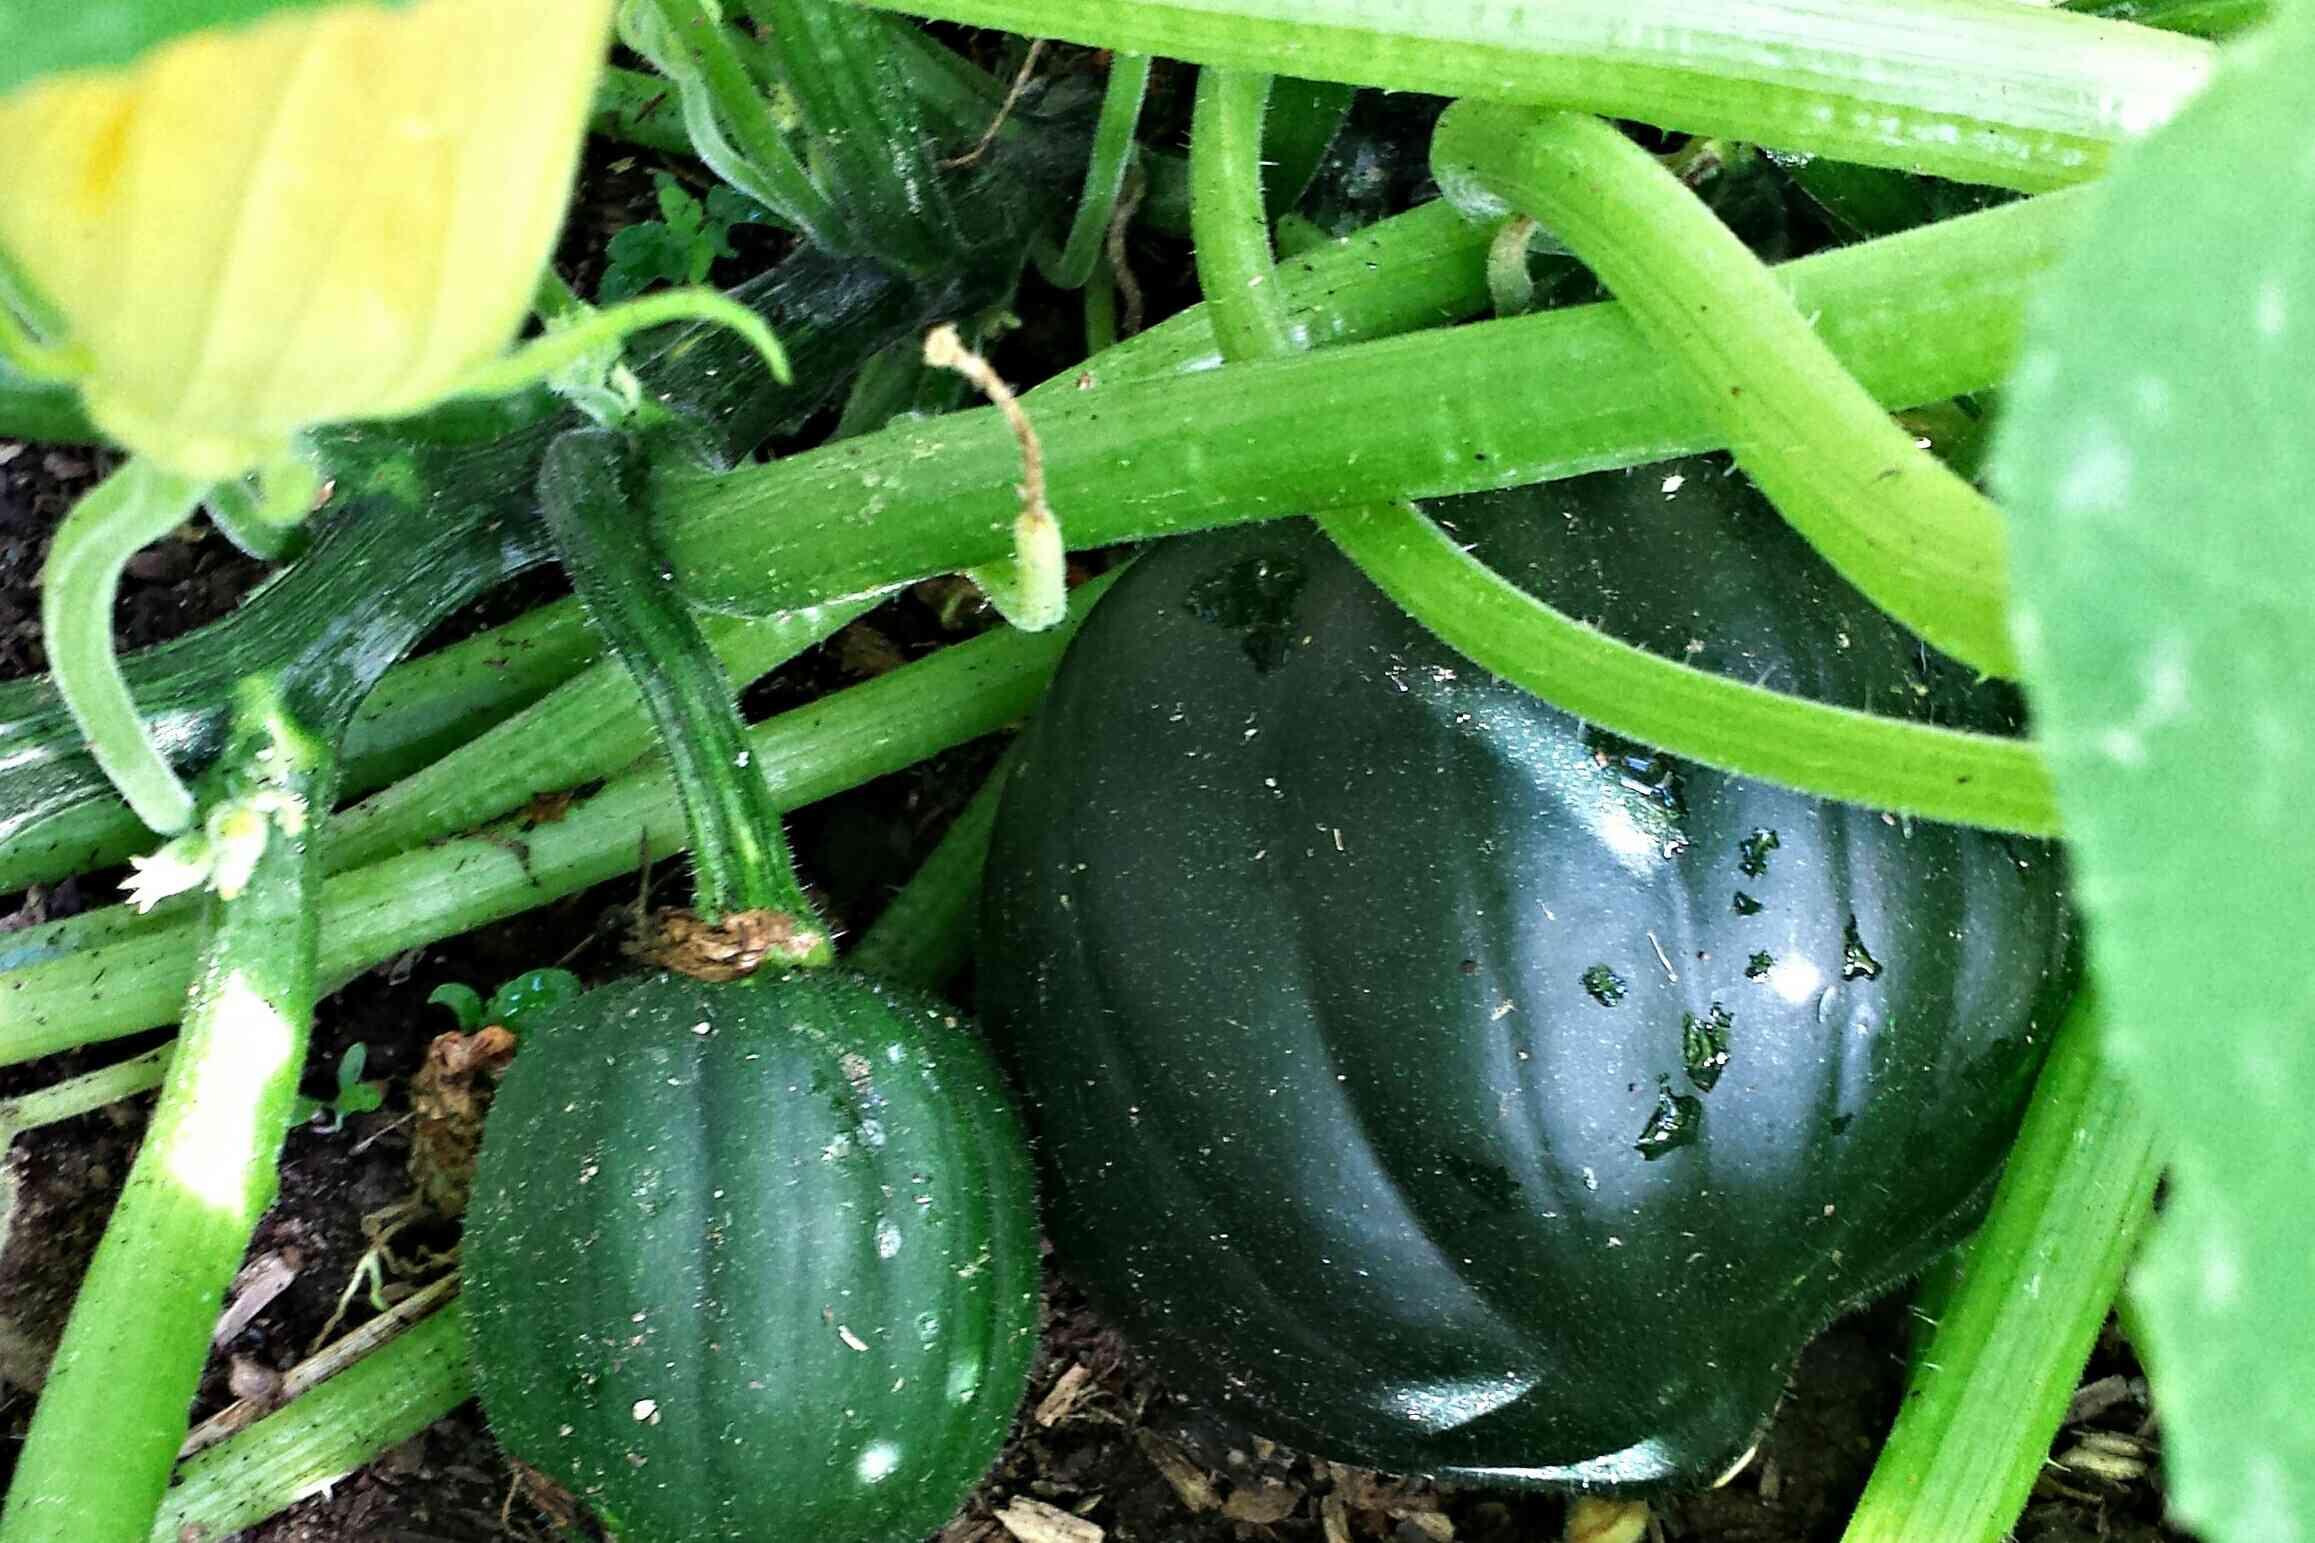 Dark green squash growing on the ground